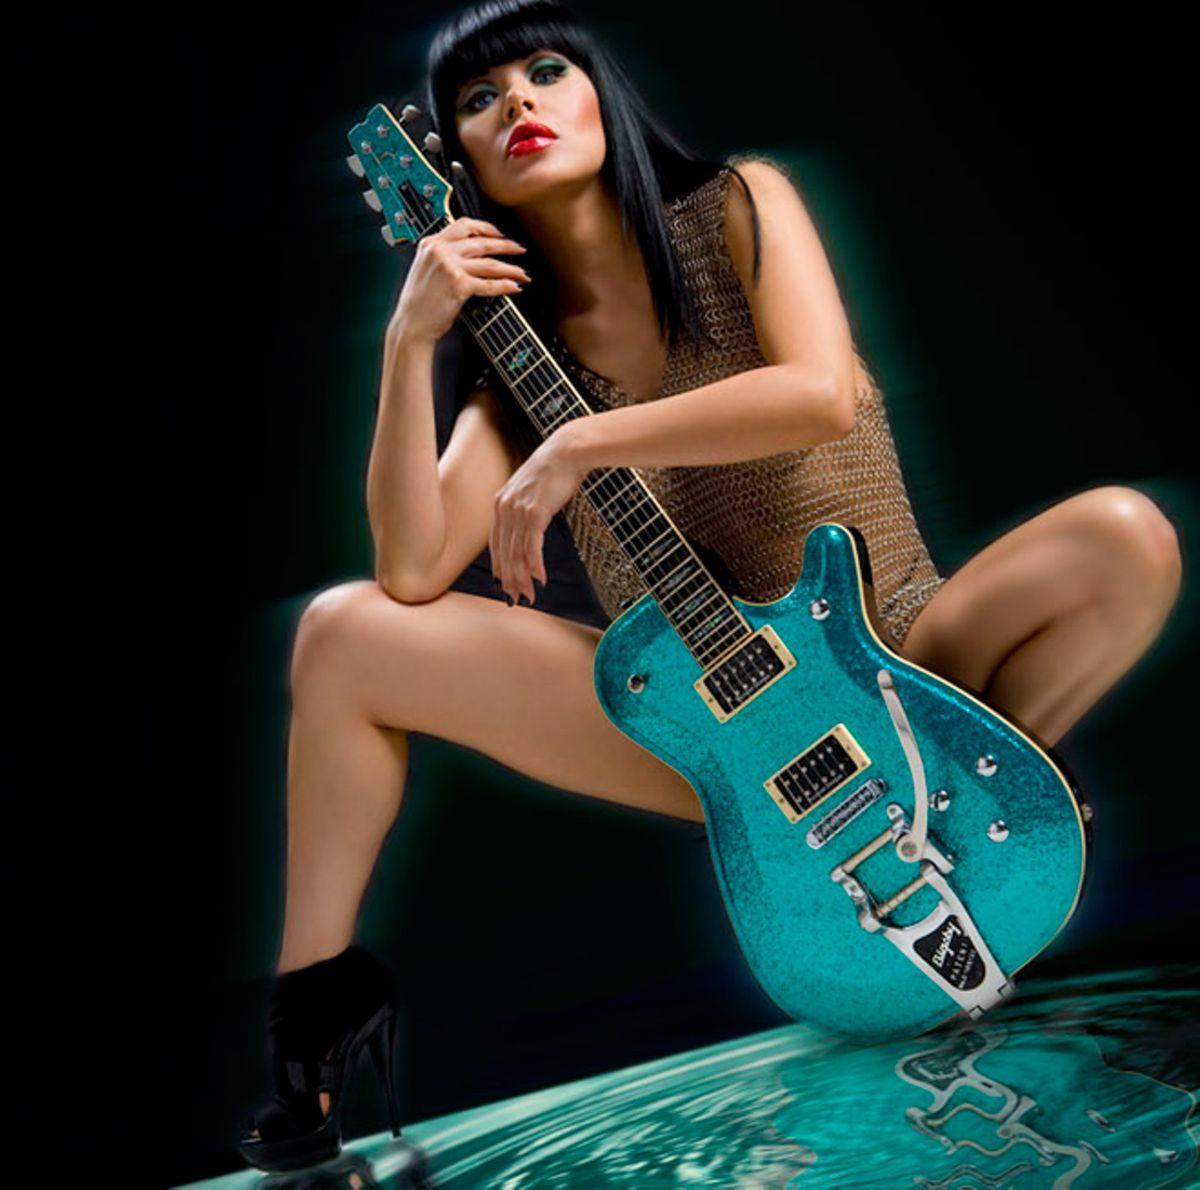 Guitar_13.jpg